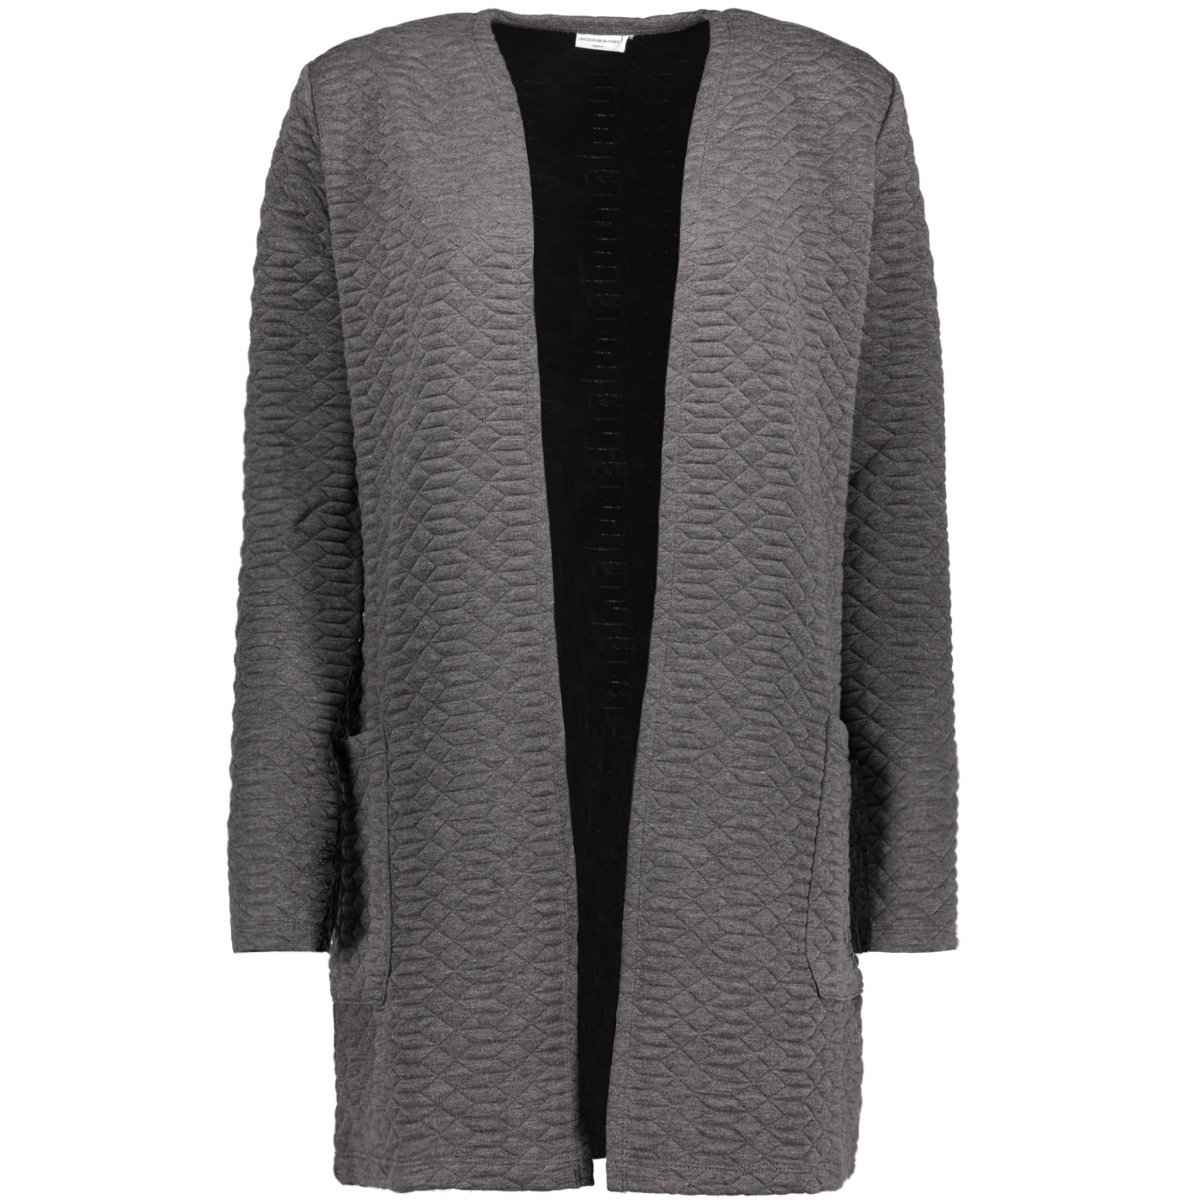 jdysoul l/s sweat cardigan swt 15140963 jacqueline de yong vest dark grey melange